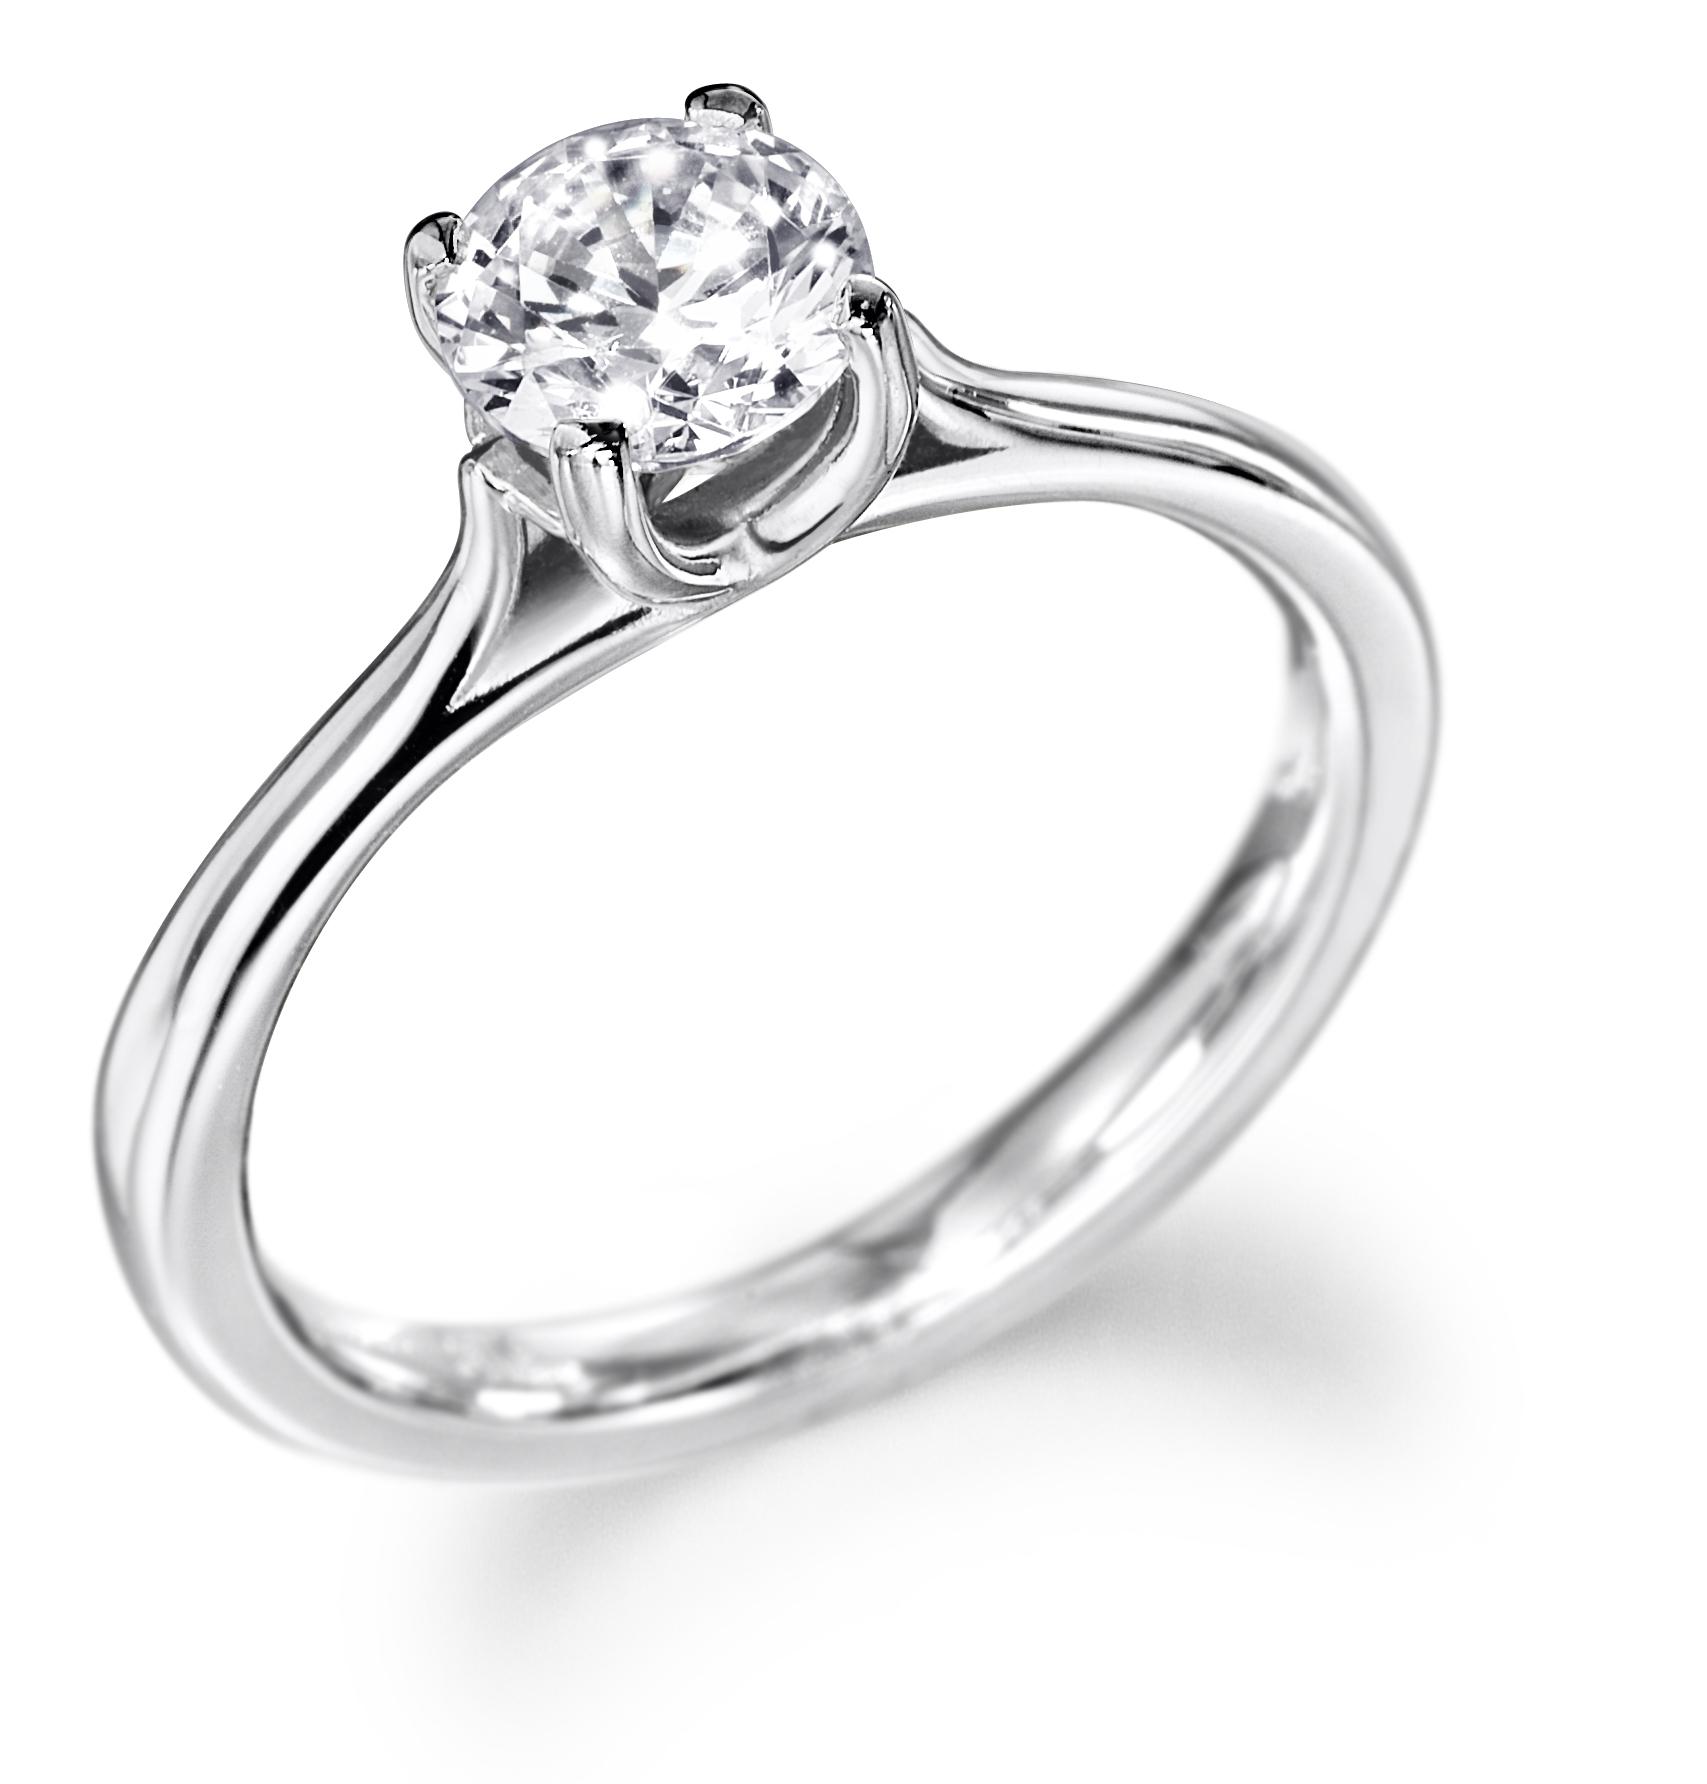 0.30ct Platinum Mounted Diamond Solitaire Ring-0